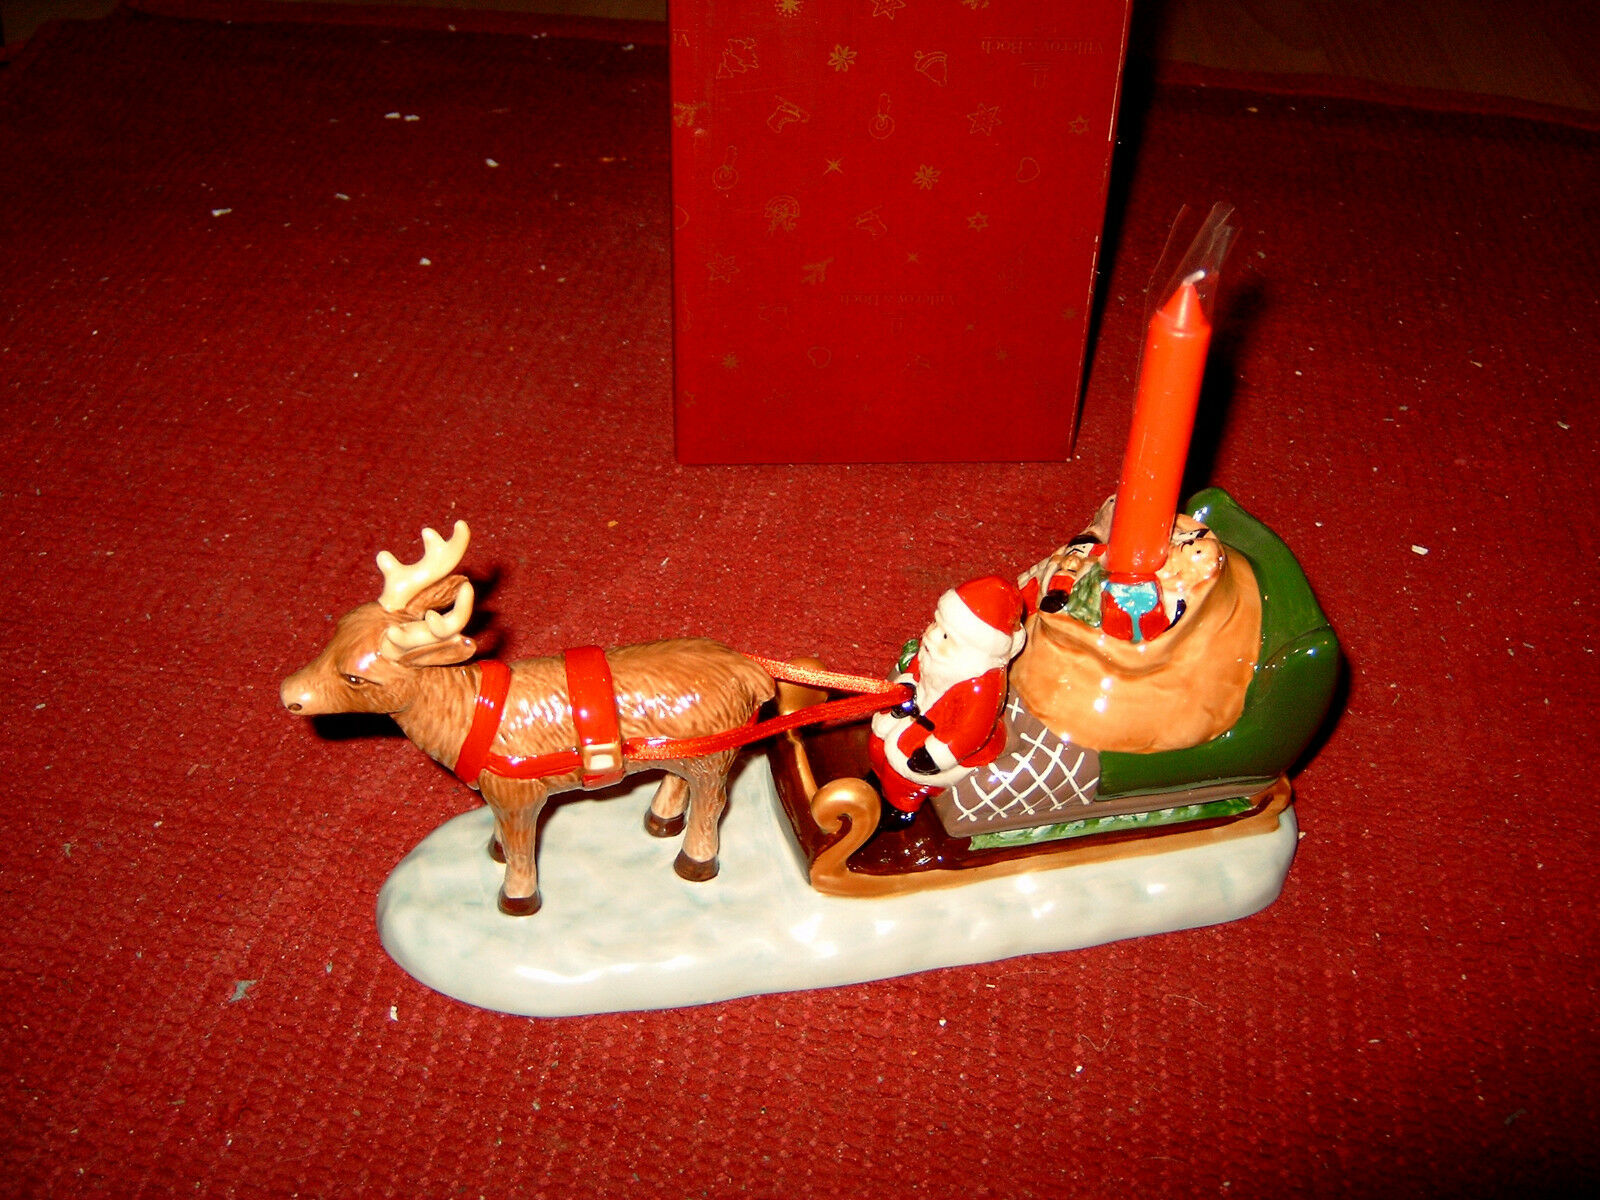 Villeroy Villeroy Villeroy & Boch North Pole Express Santas slitta 6537,neu&ovp d7583e